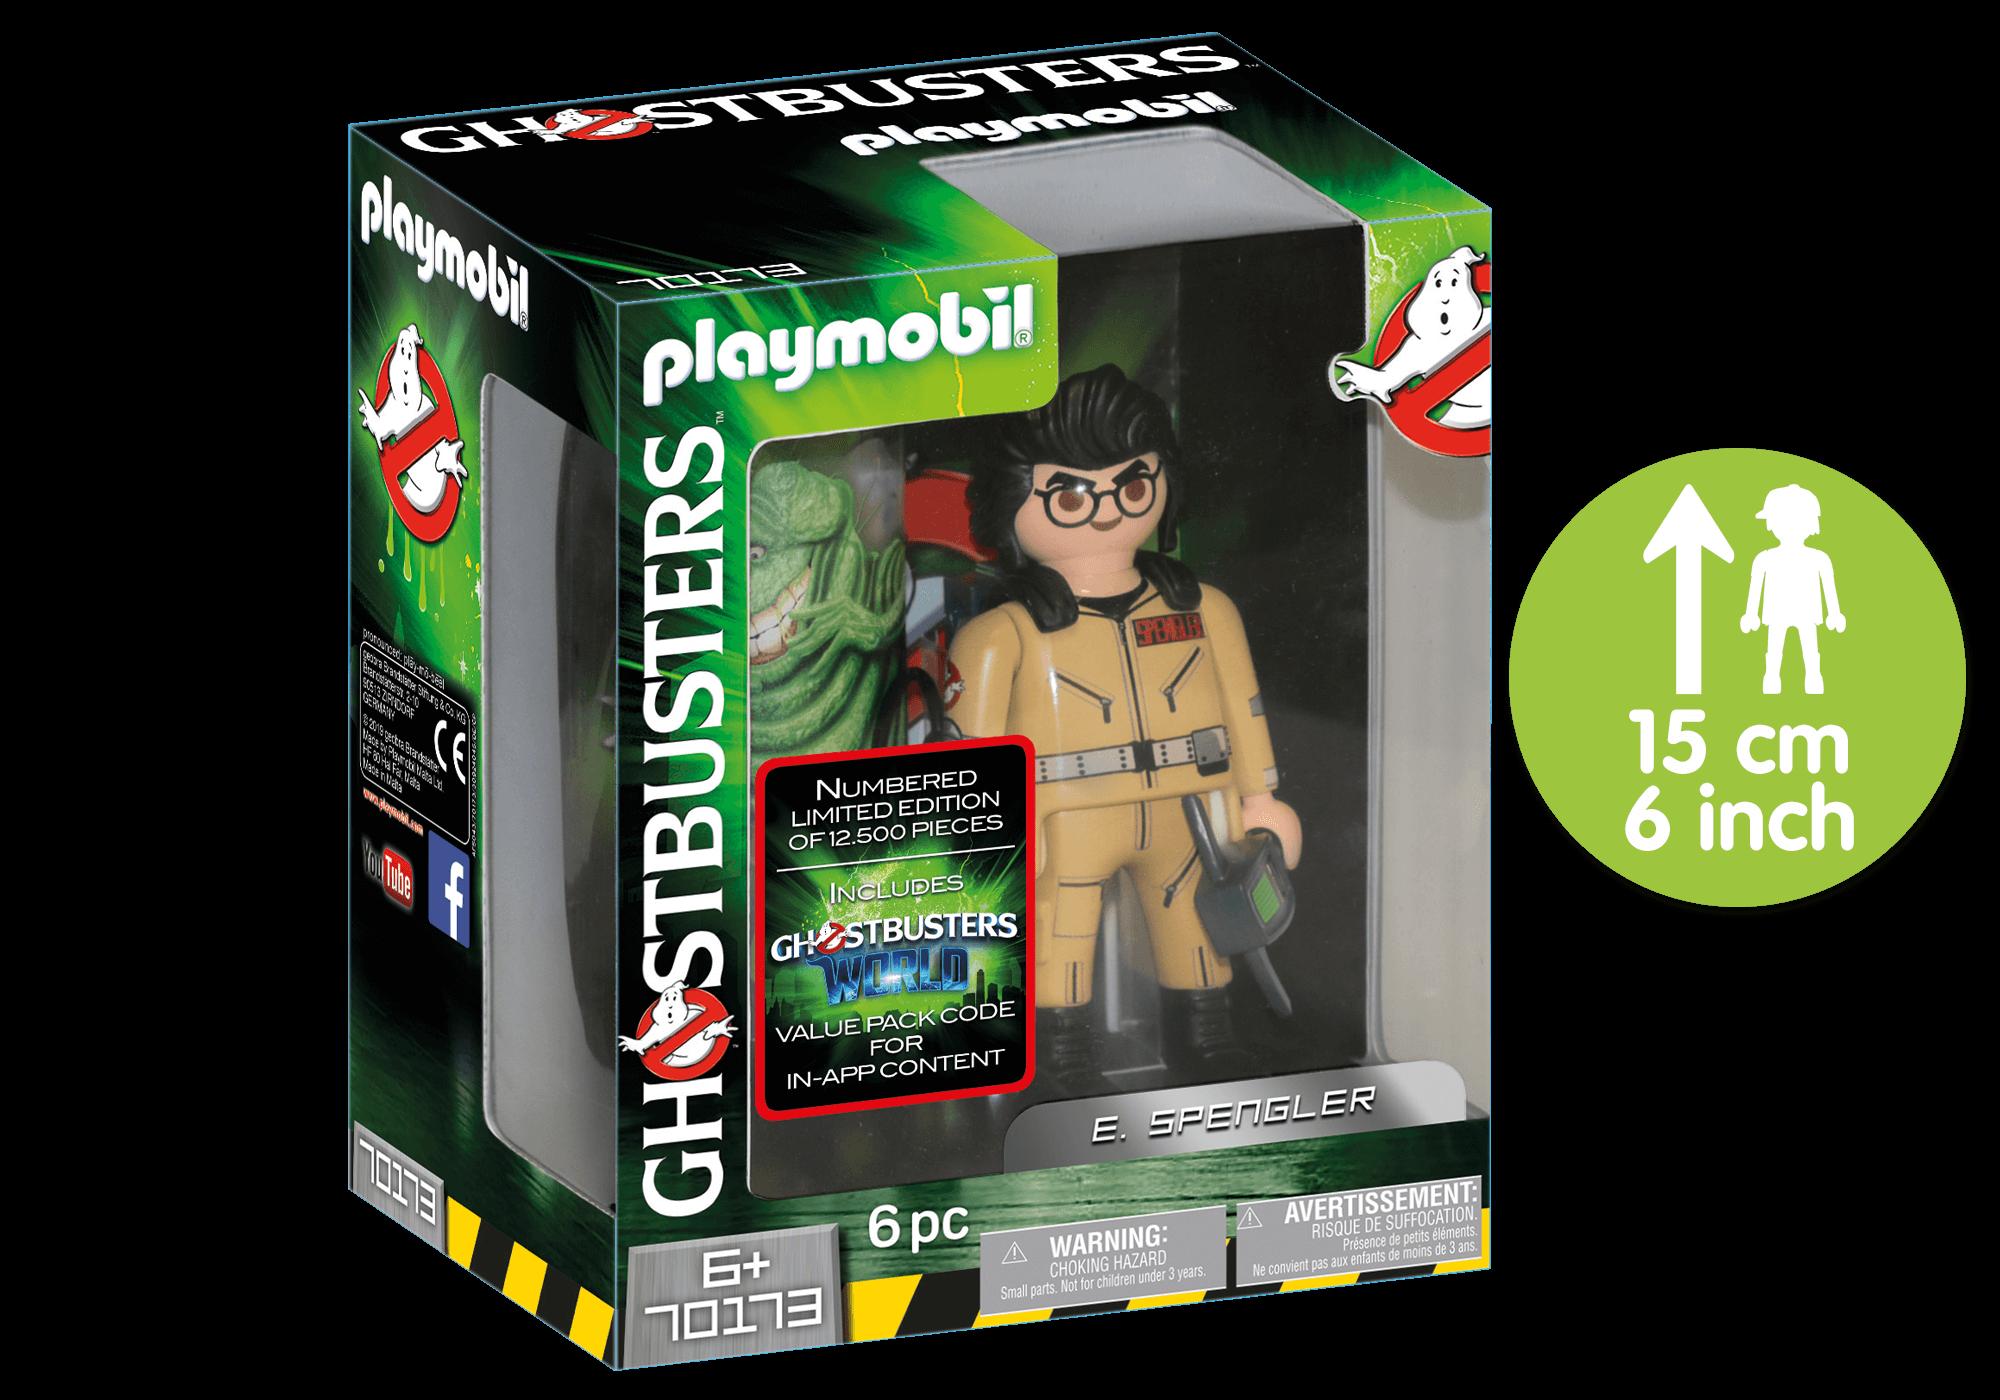 http://media.playmobil.com/i/playmobil/70173_product_detail/Ghostbusters™ Figura Coleccionable E. Spengler